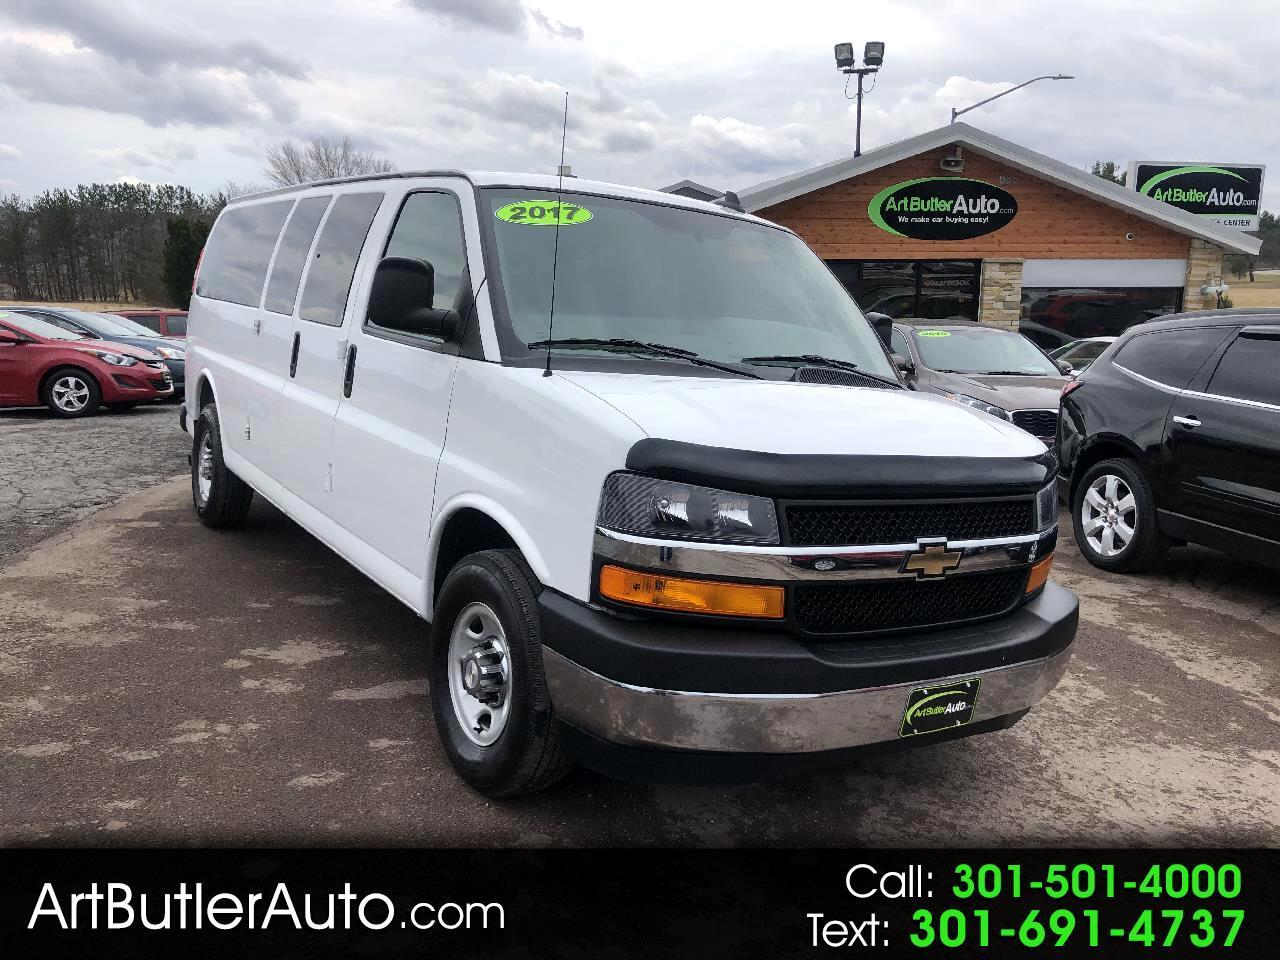 2017 Chevrolet Express Passenger RWD 3500 155